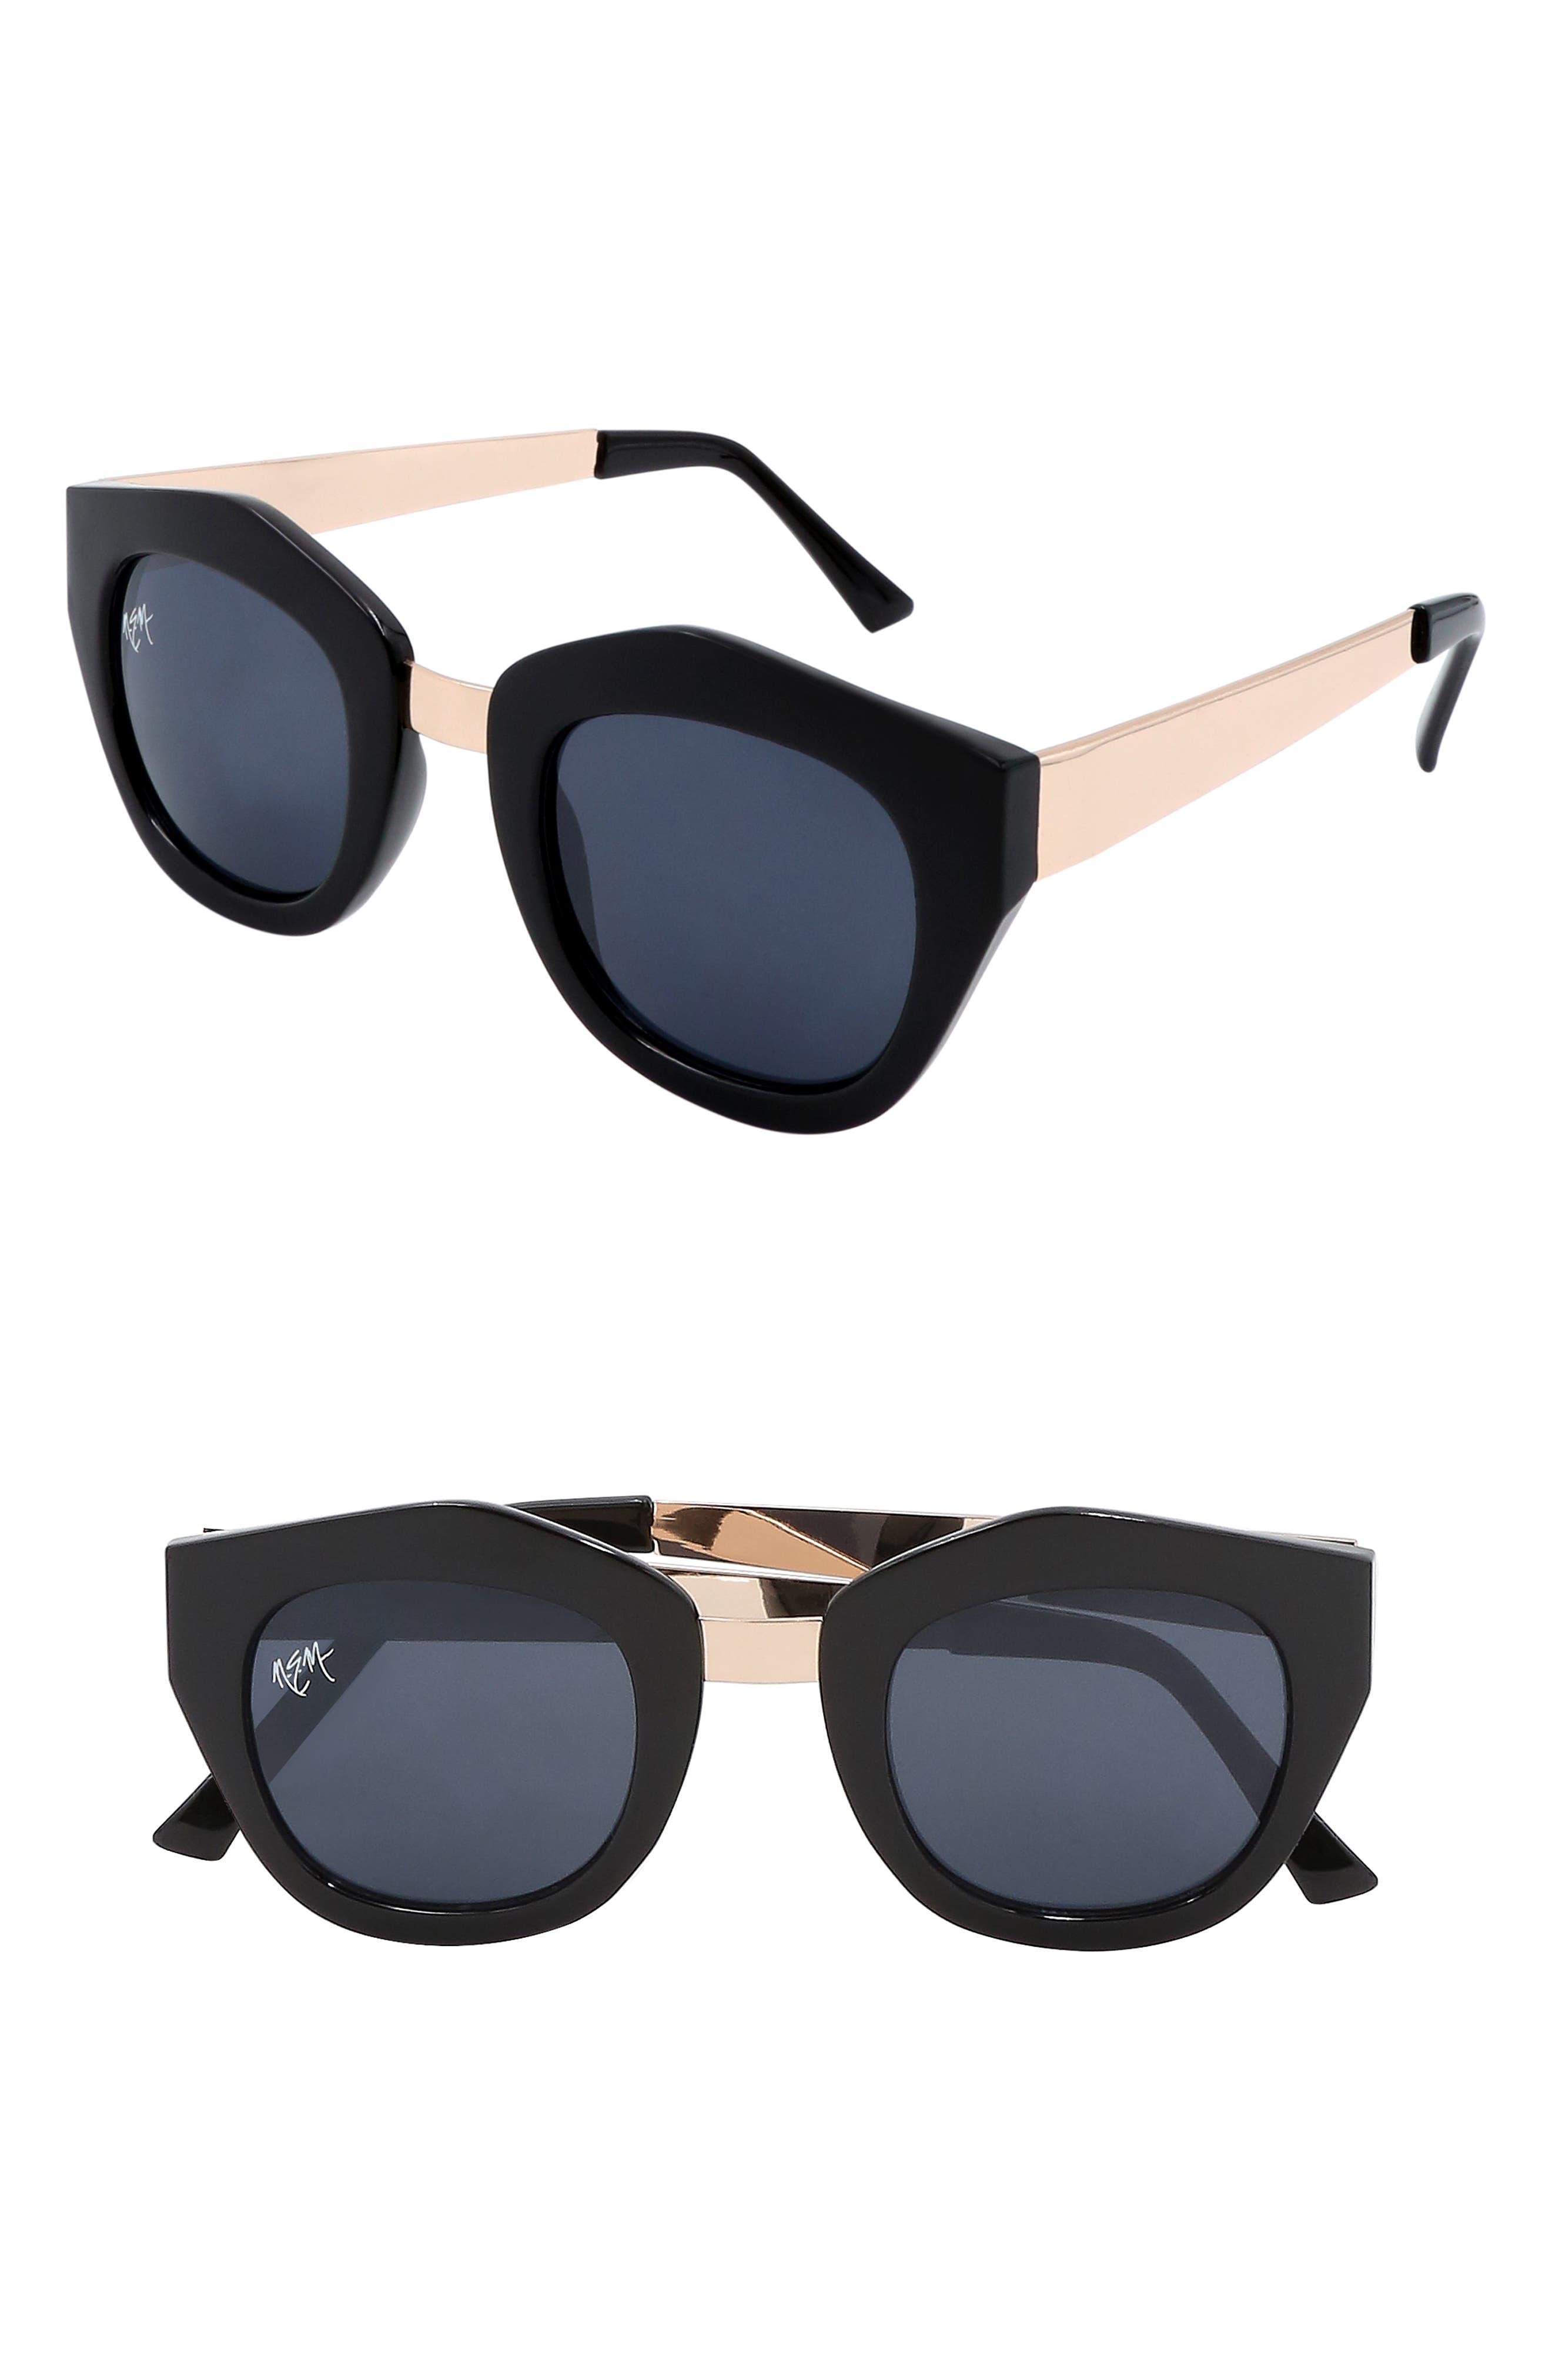 Envy 45mm Angular Sunglasses,                         Main,                         color, BLACK W DARK LENS